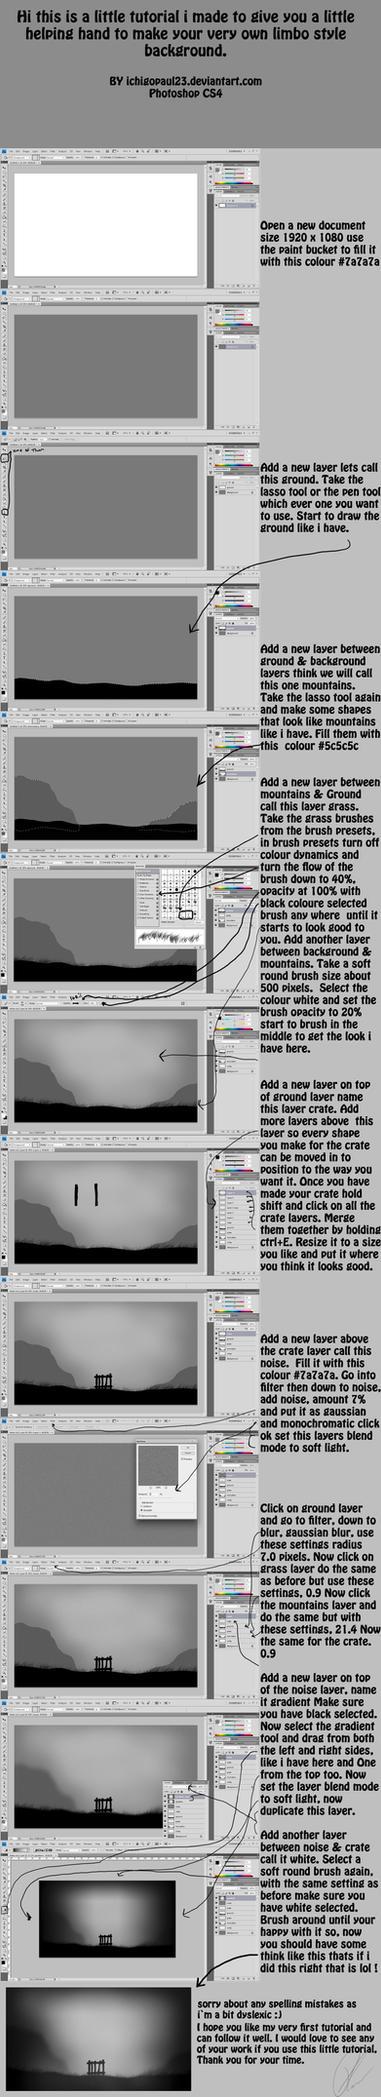 limbo background tutorial by ichigopaul23